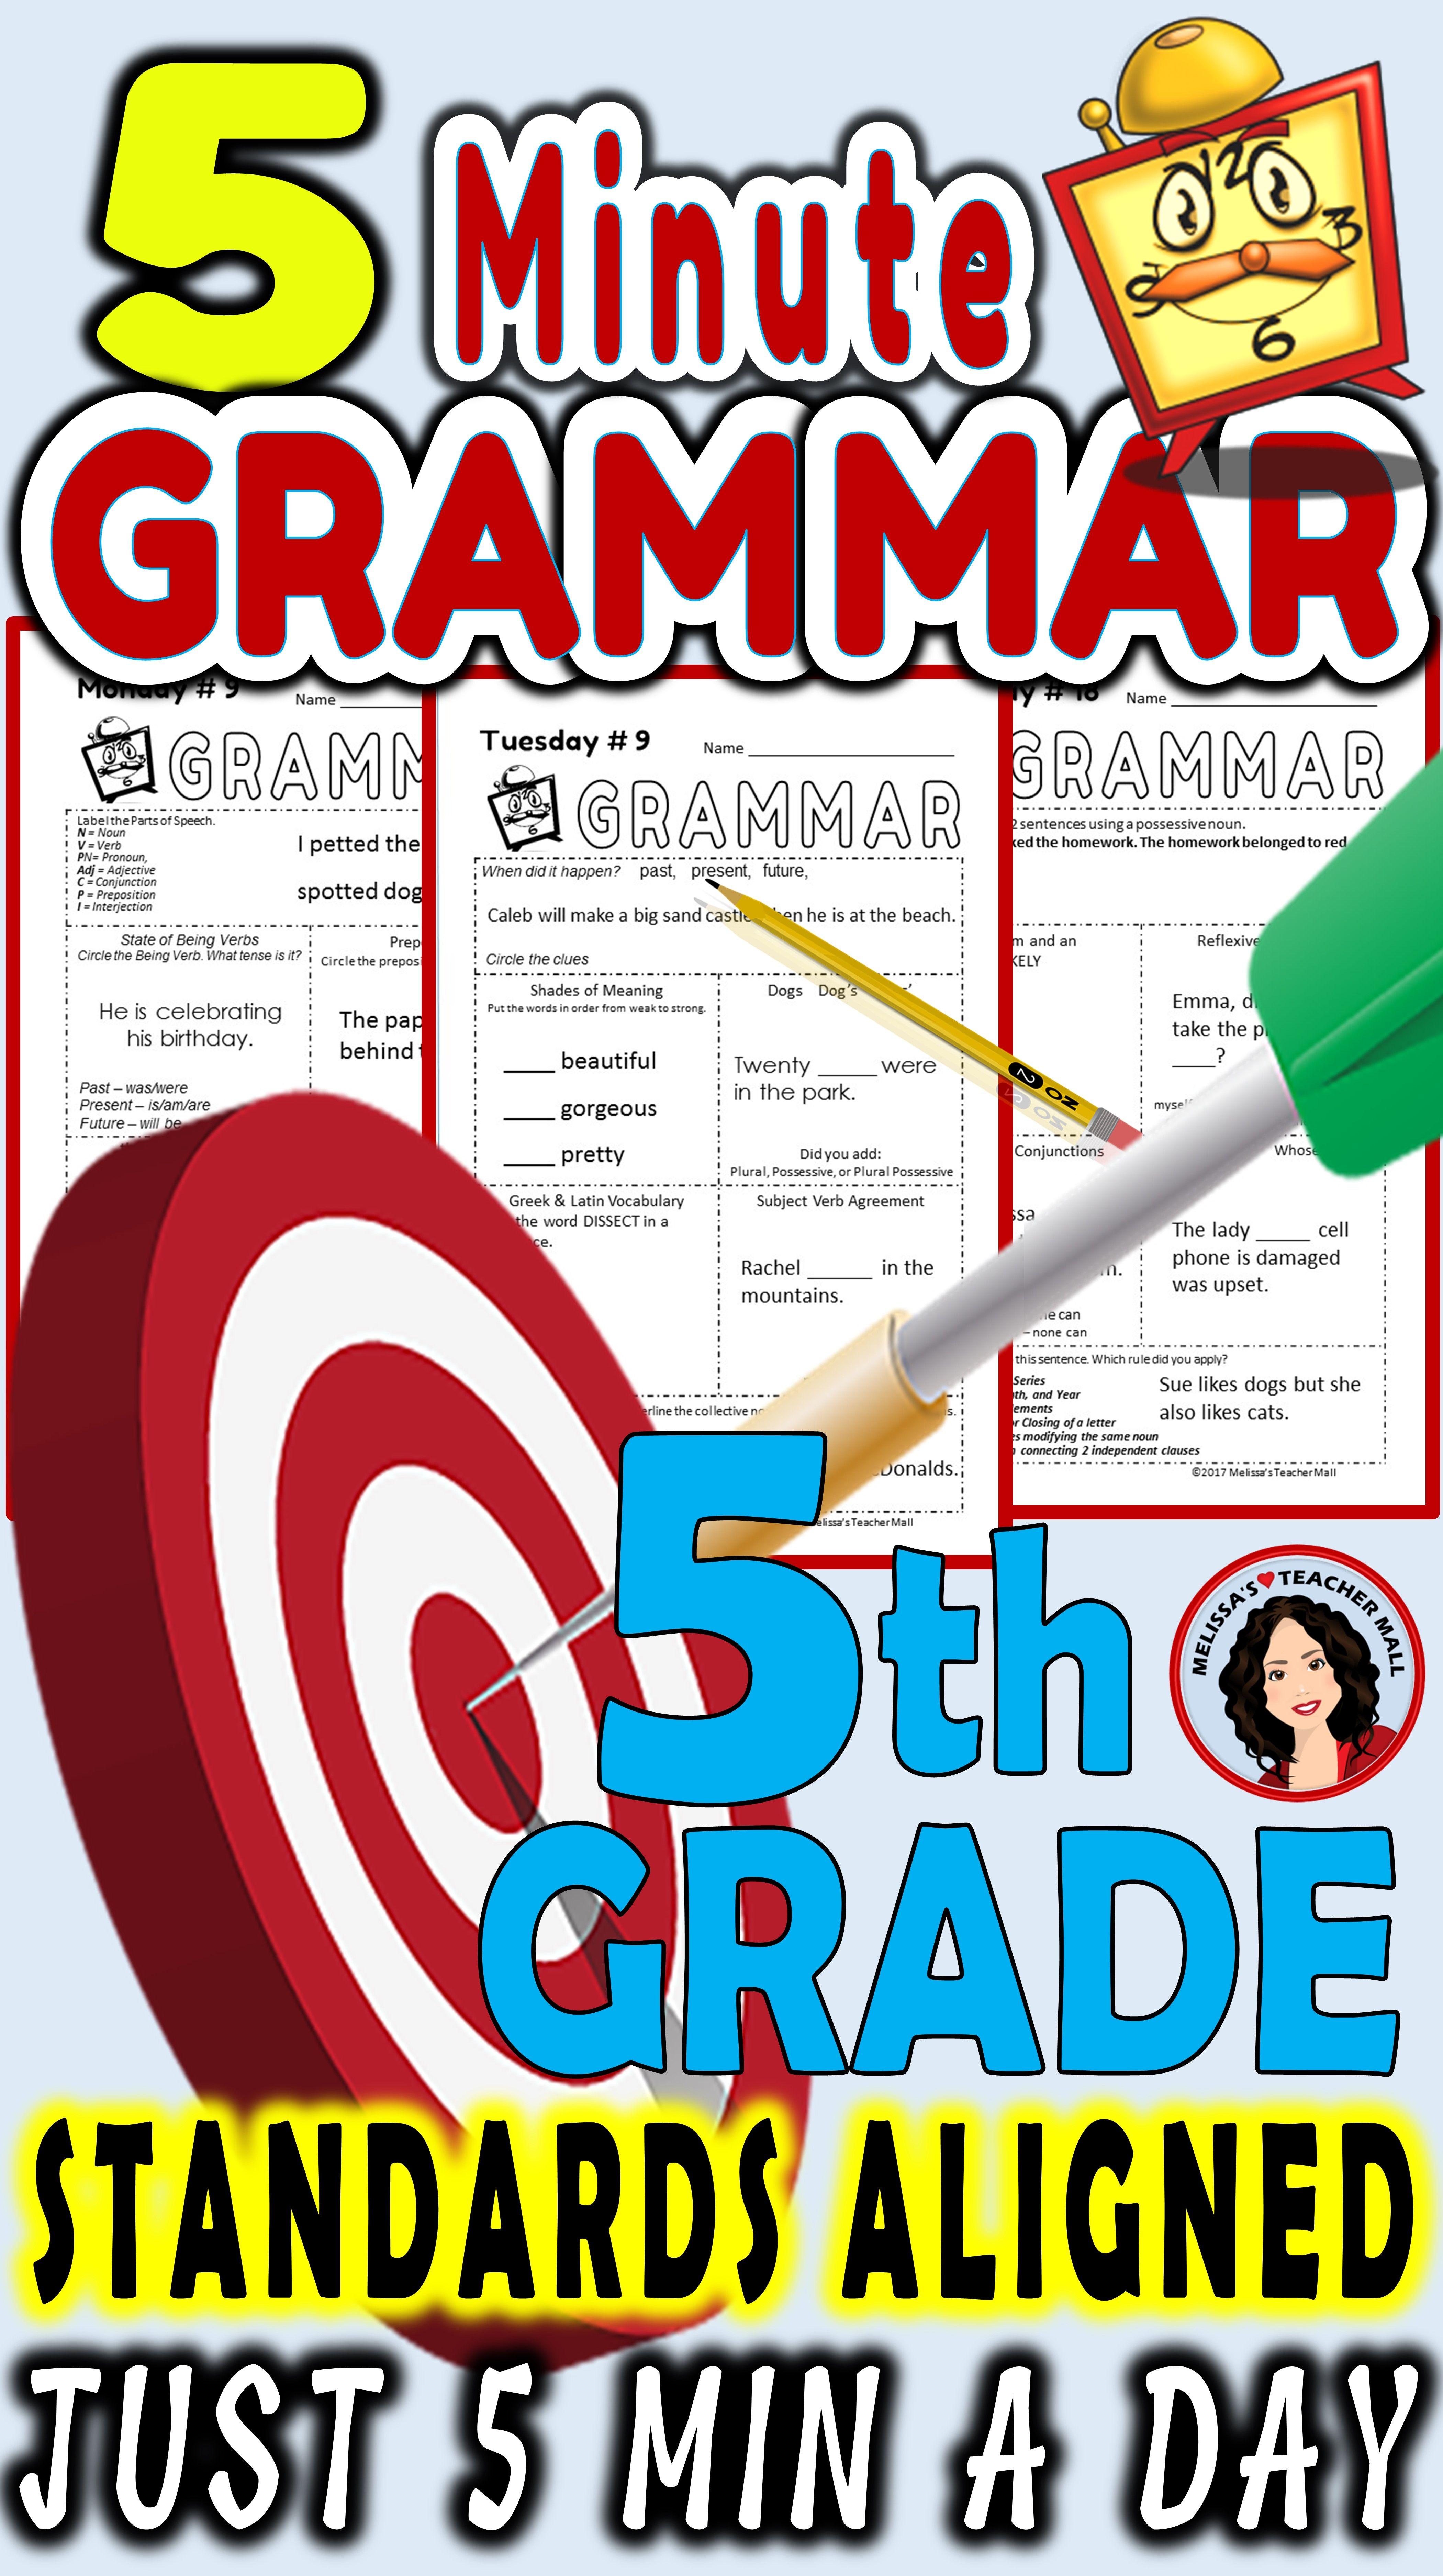 5 Minute Grammar Daily Grammar Worksheets 5th Grade